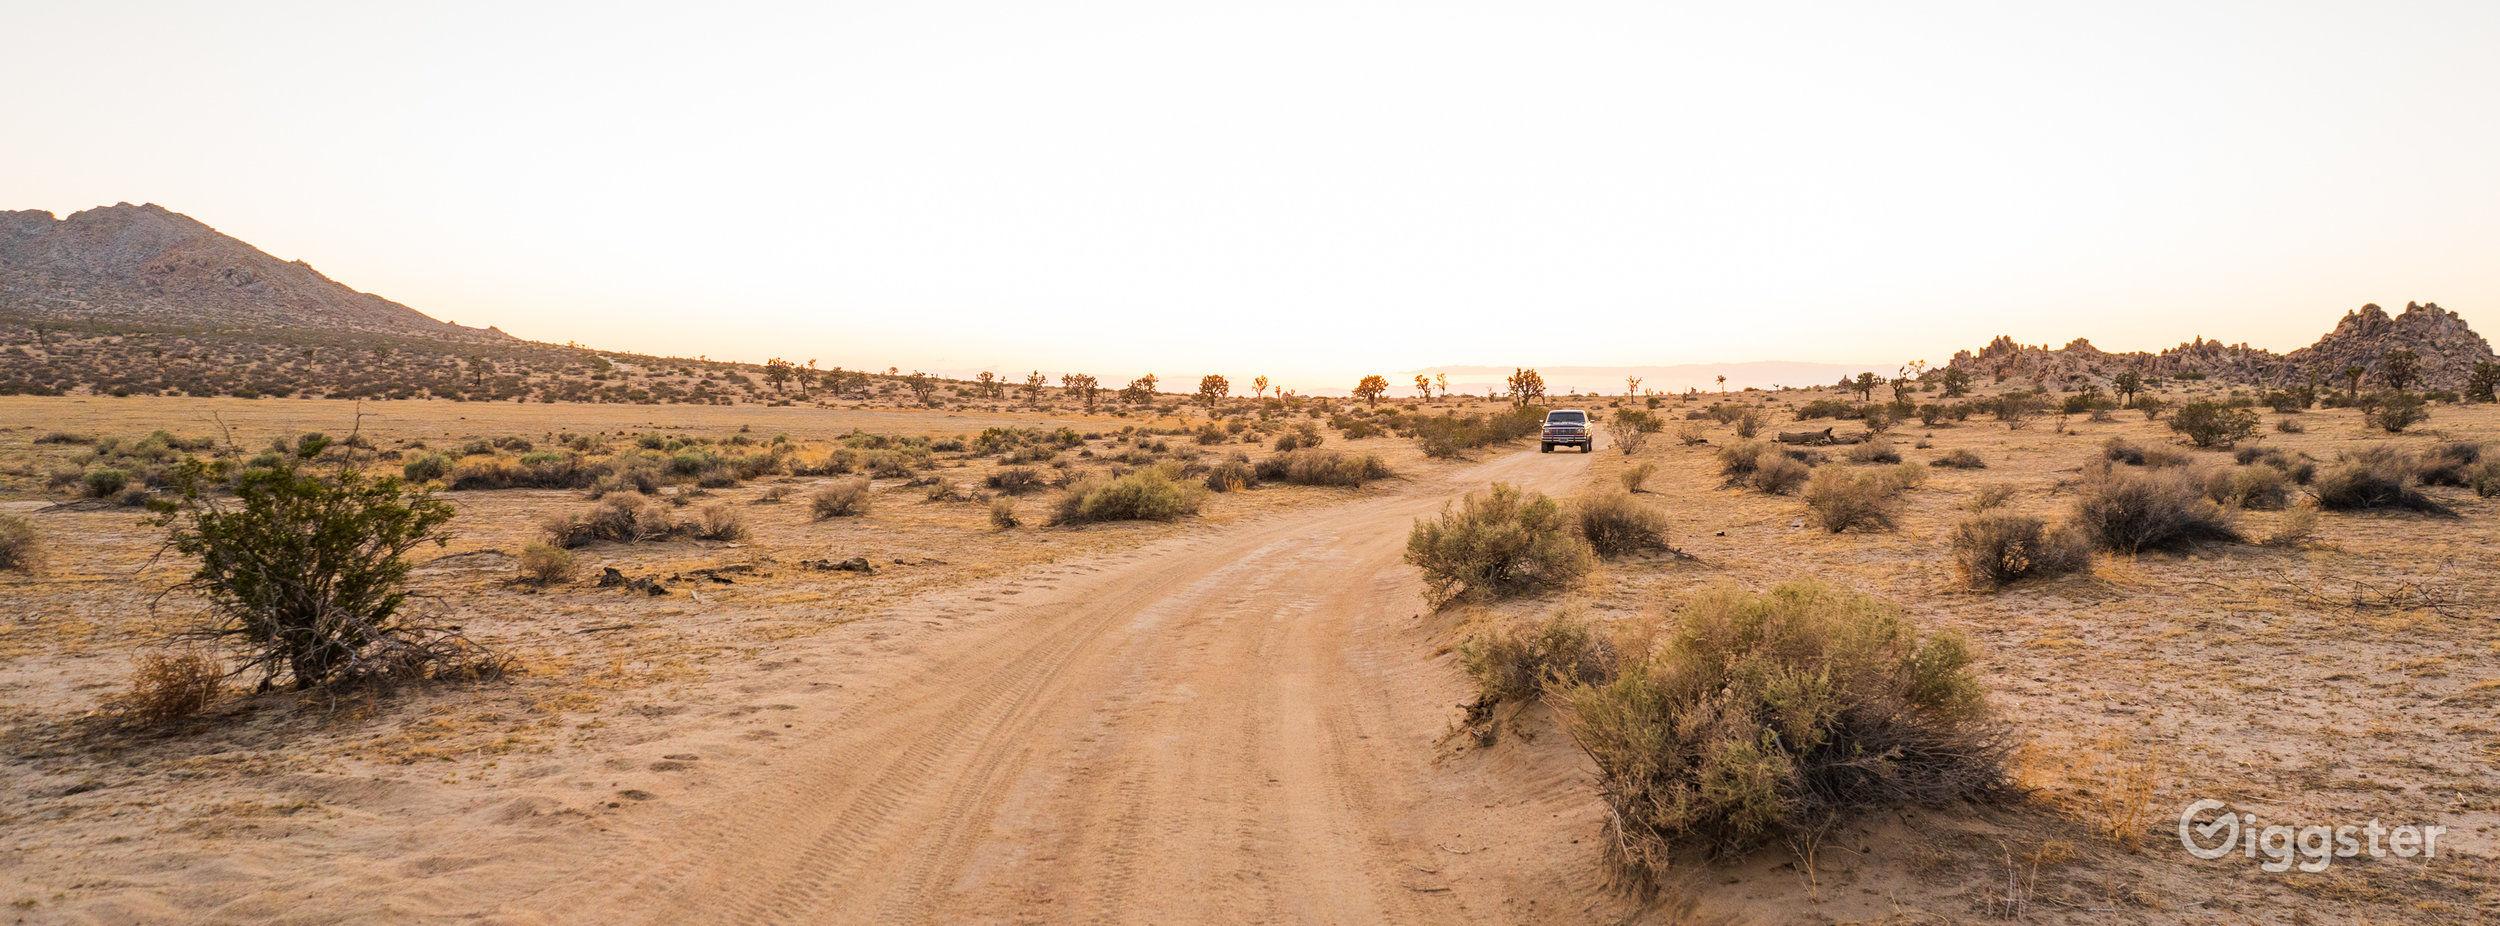 trip to desert land travel planner app